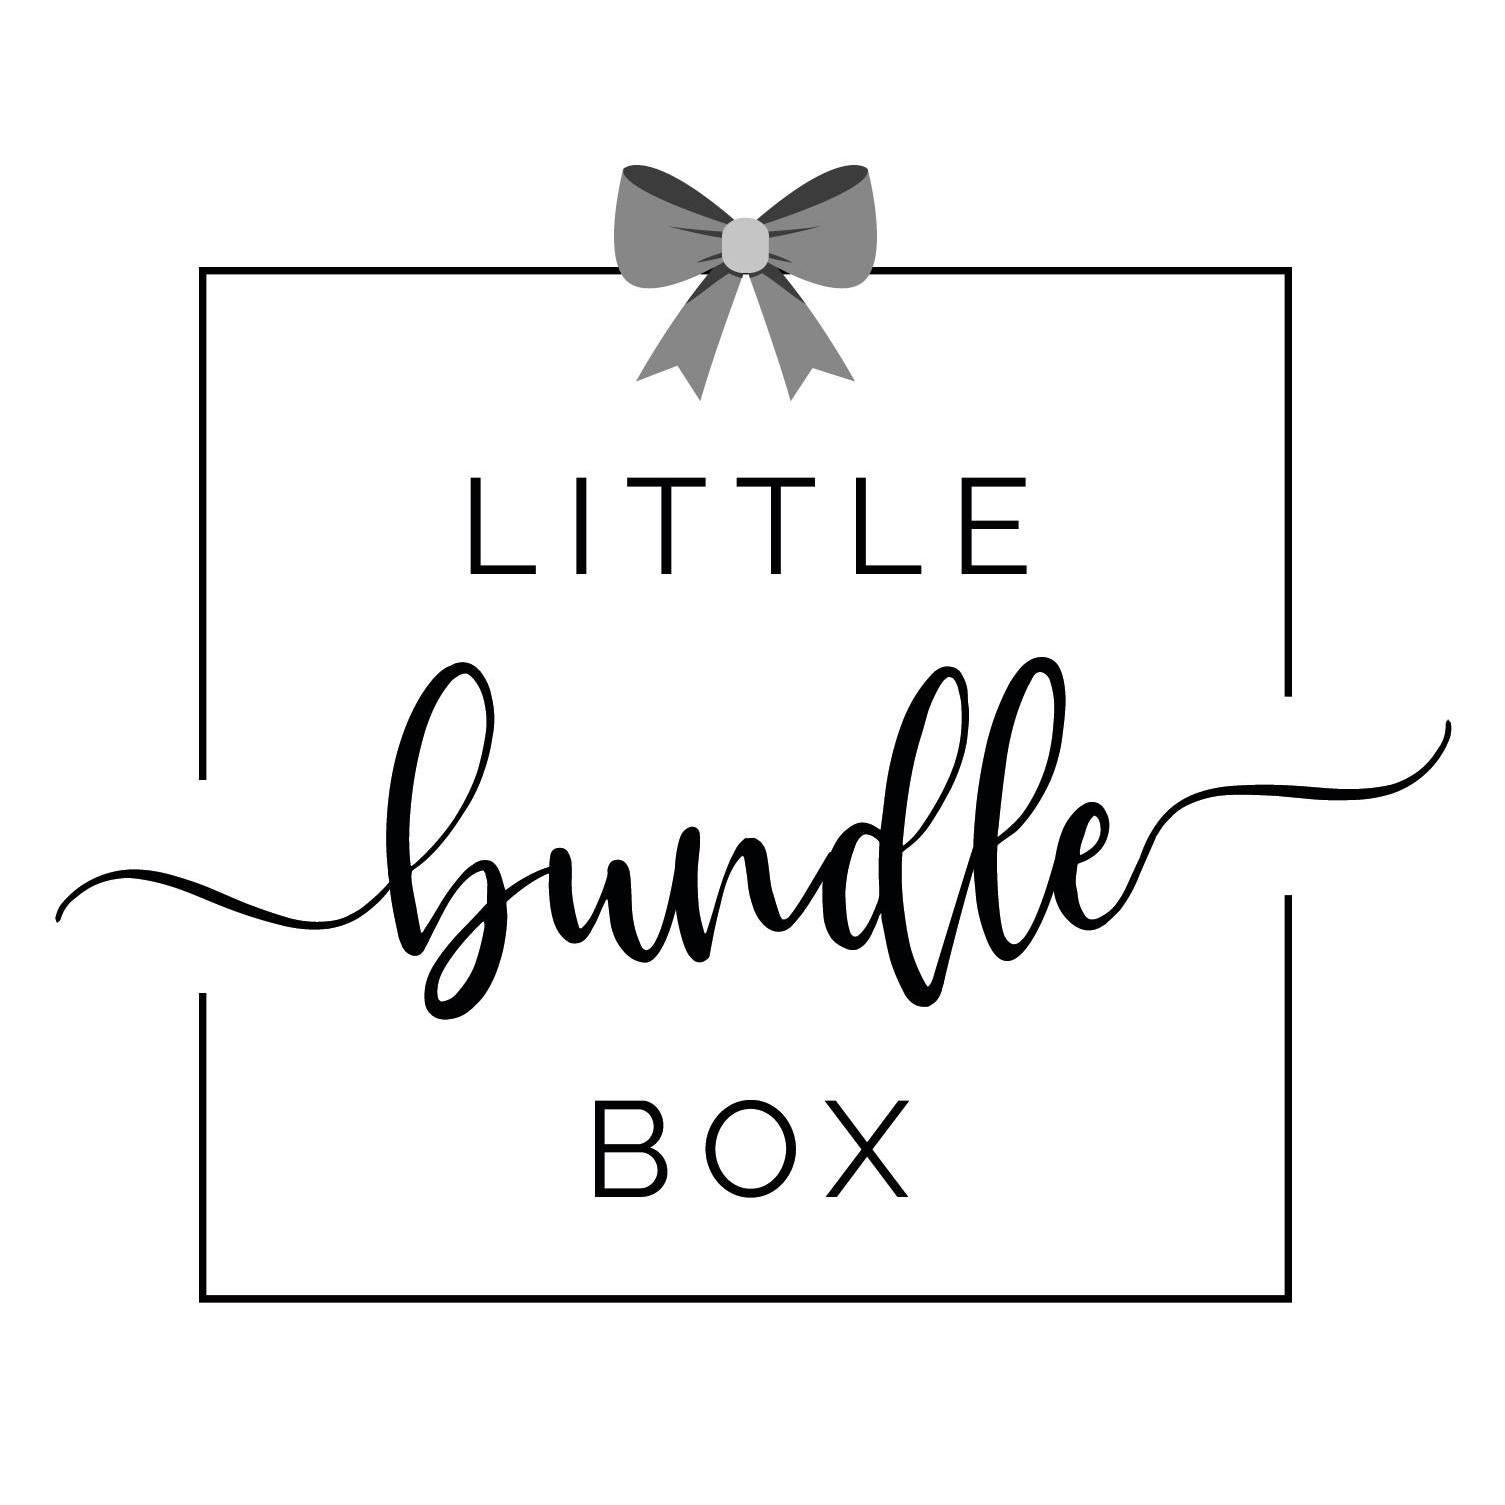 Little Bundle Box's logo